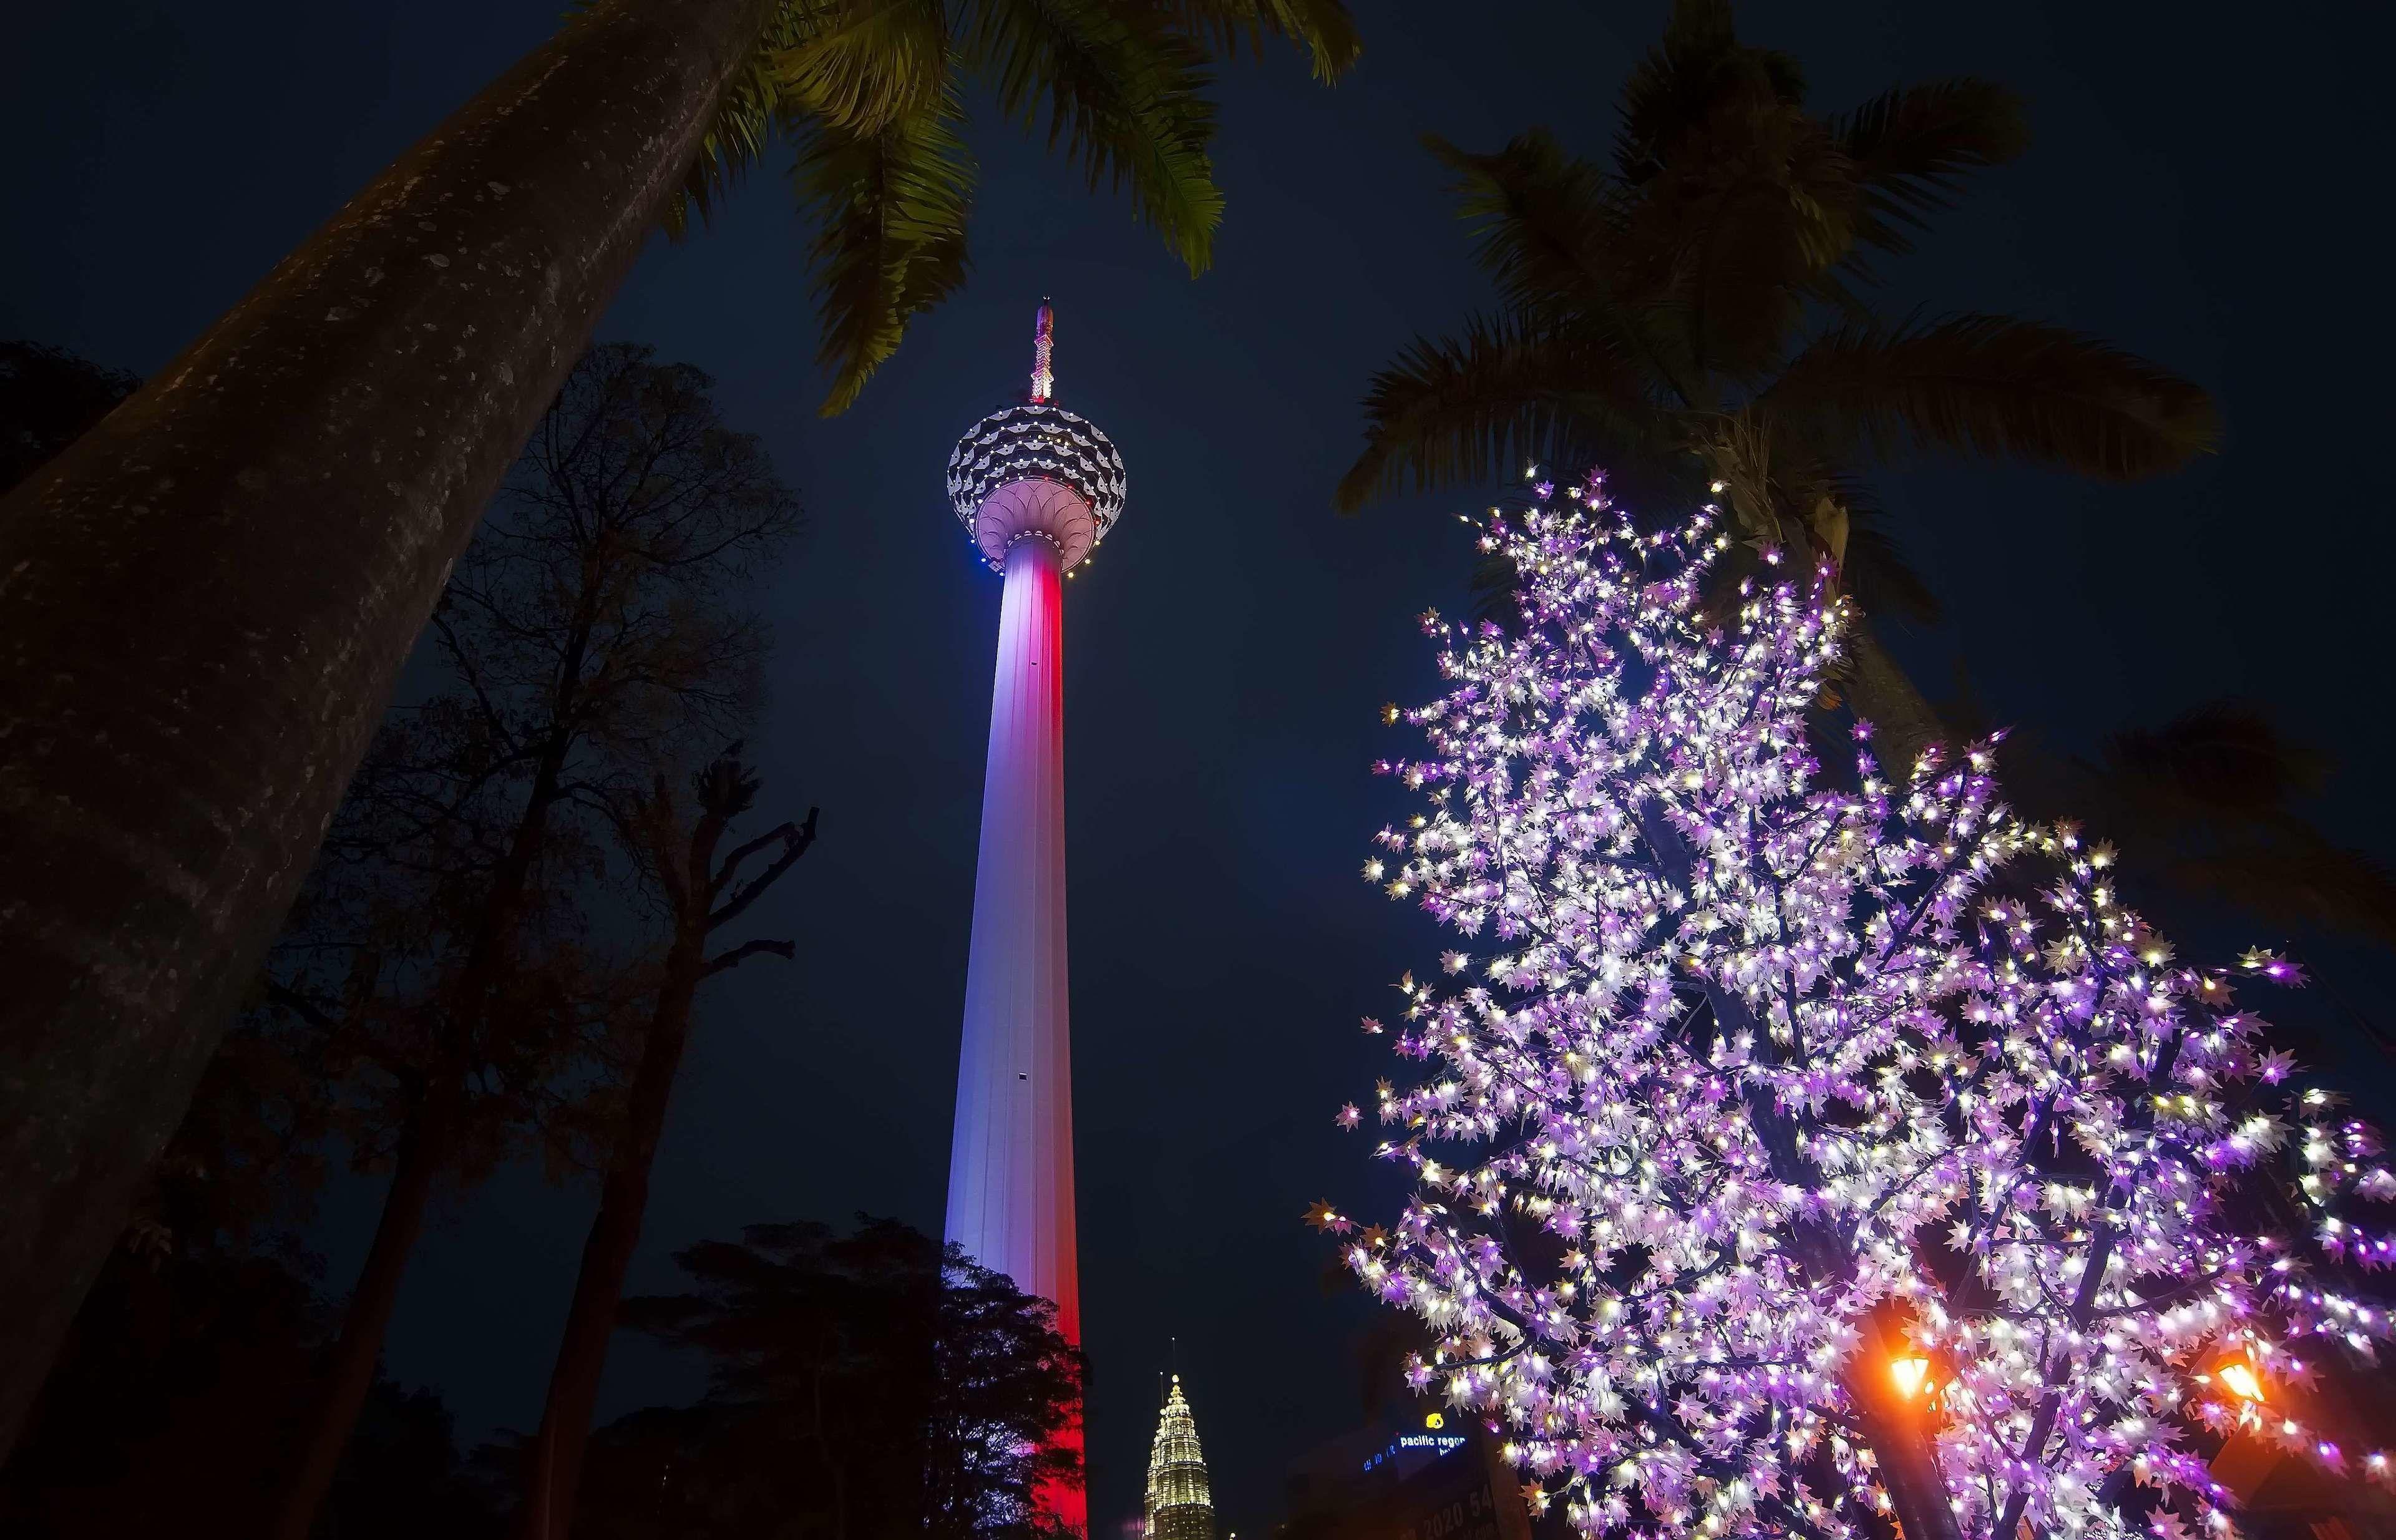 Kuala Lumpur Tower Observation Deck